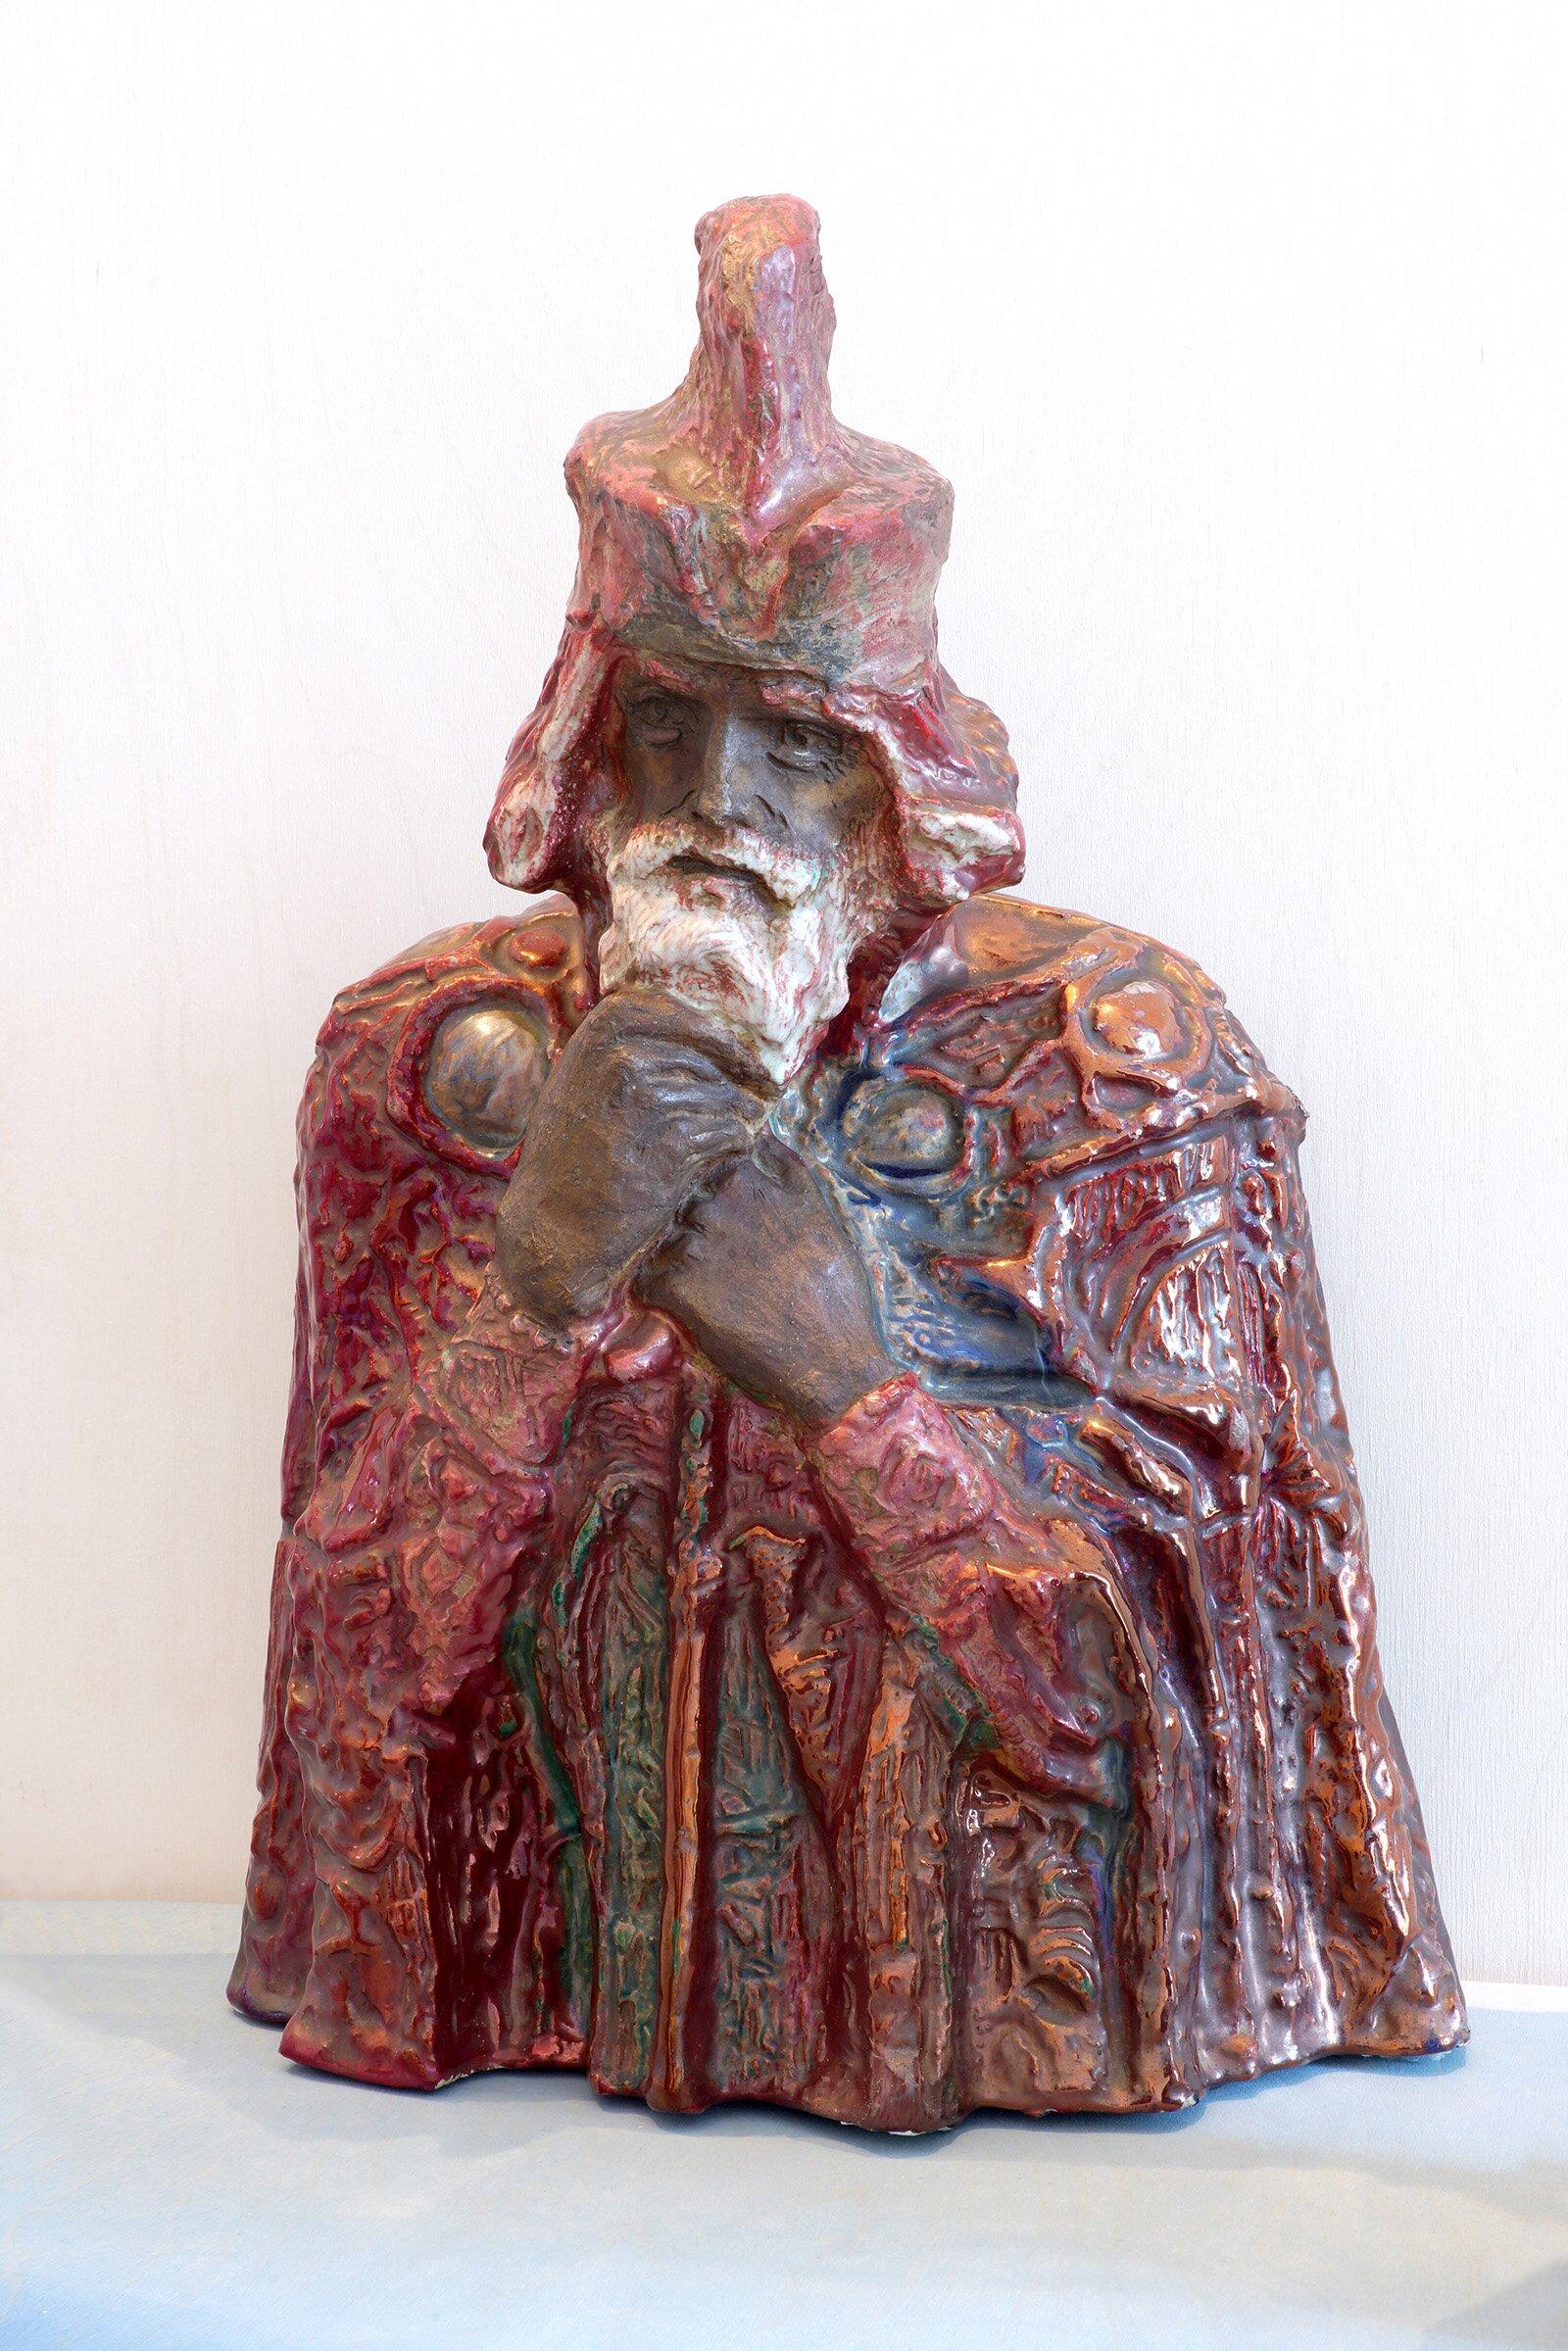 М. Врубель. Скульптура «Царь Берендей». 1899–1900 годы